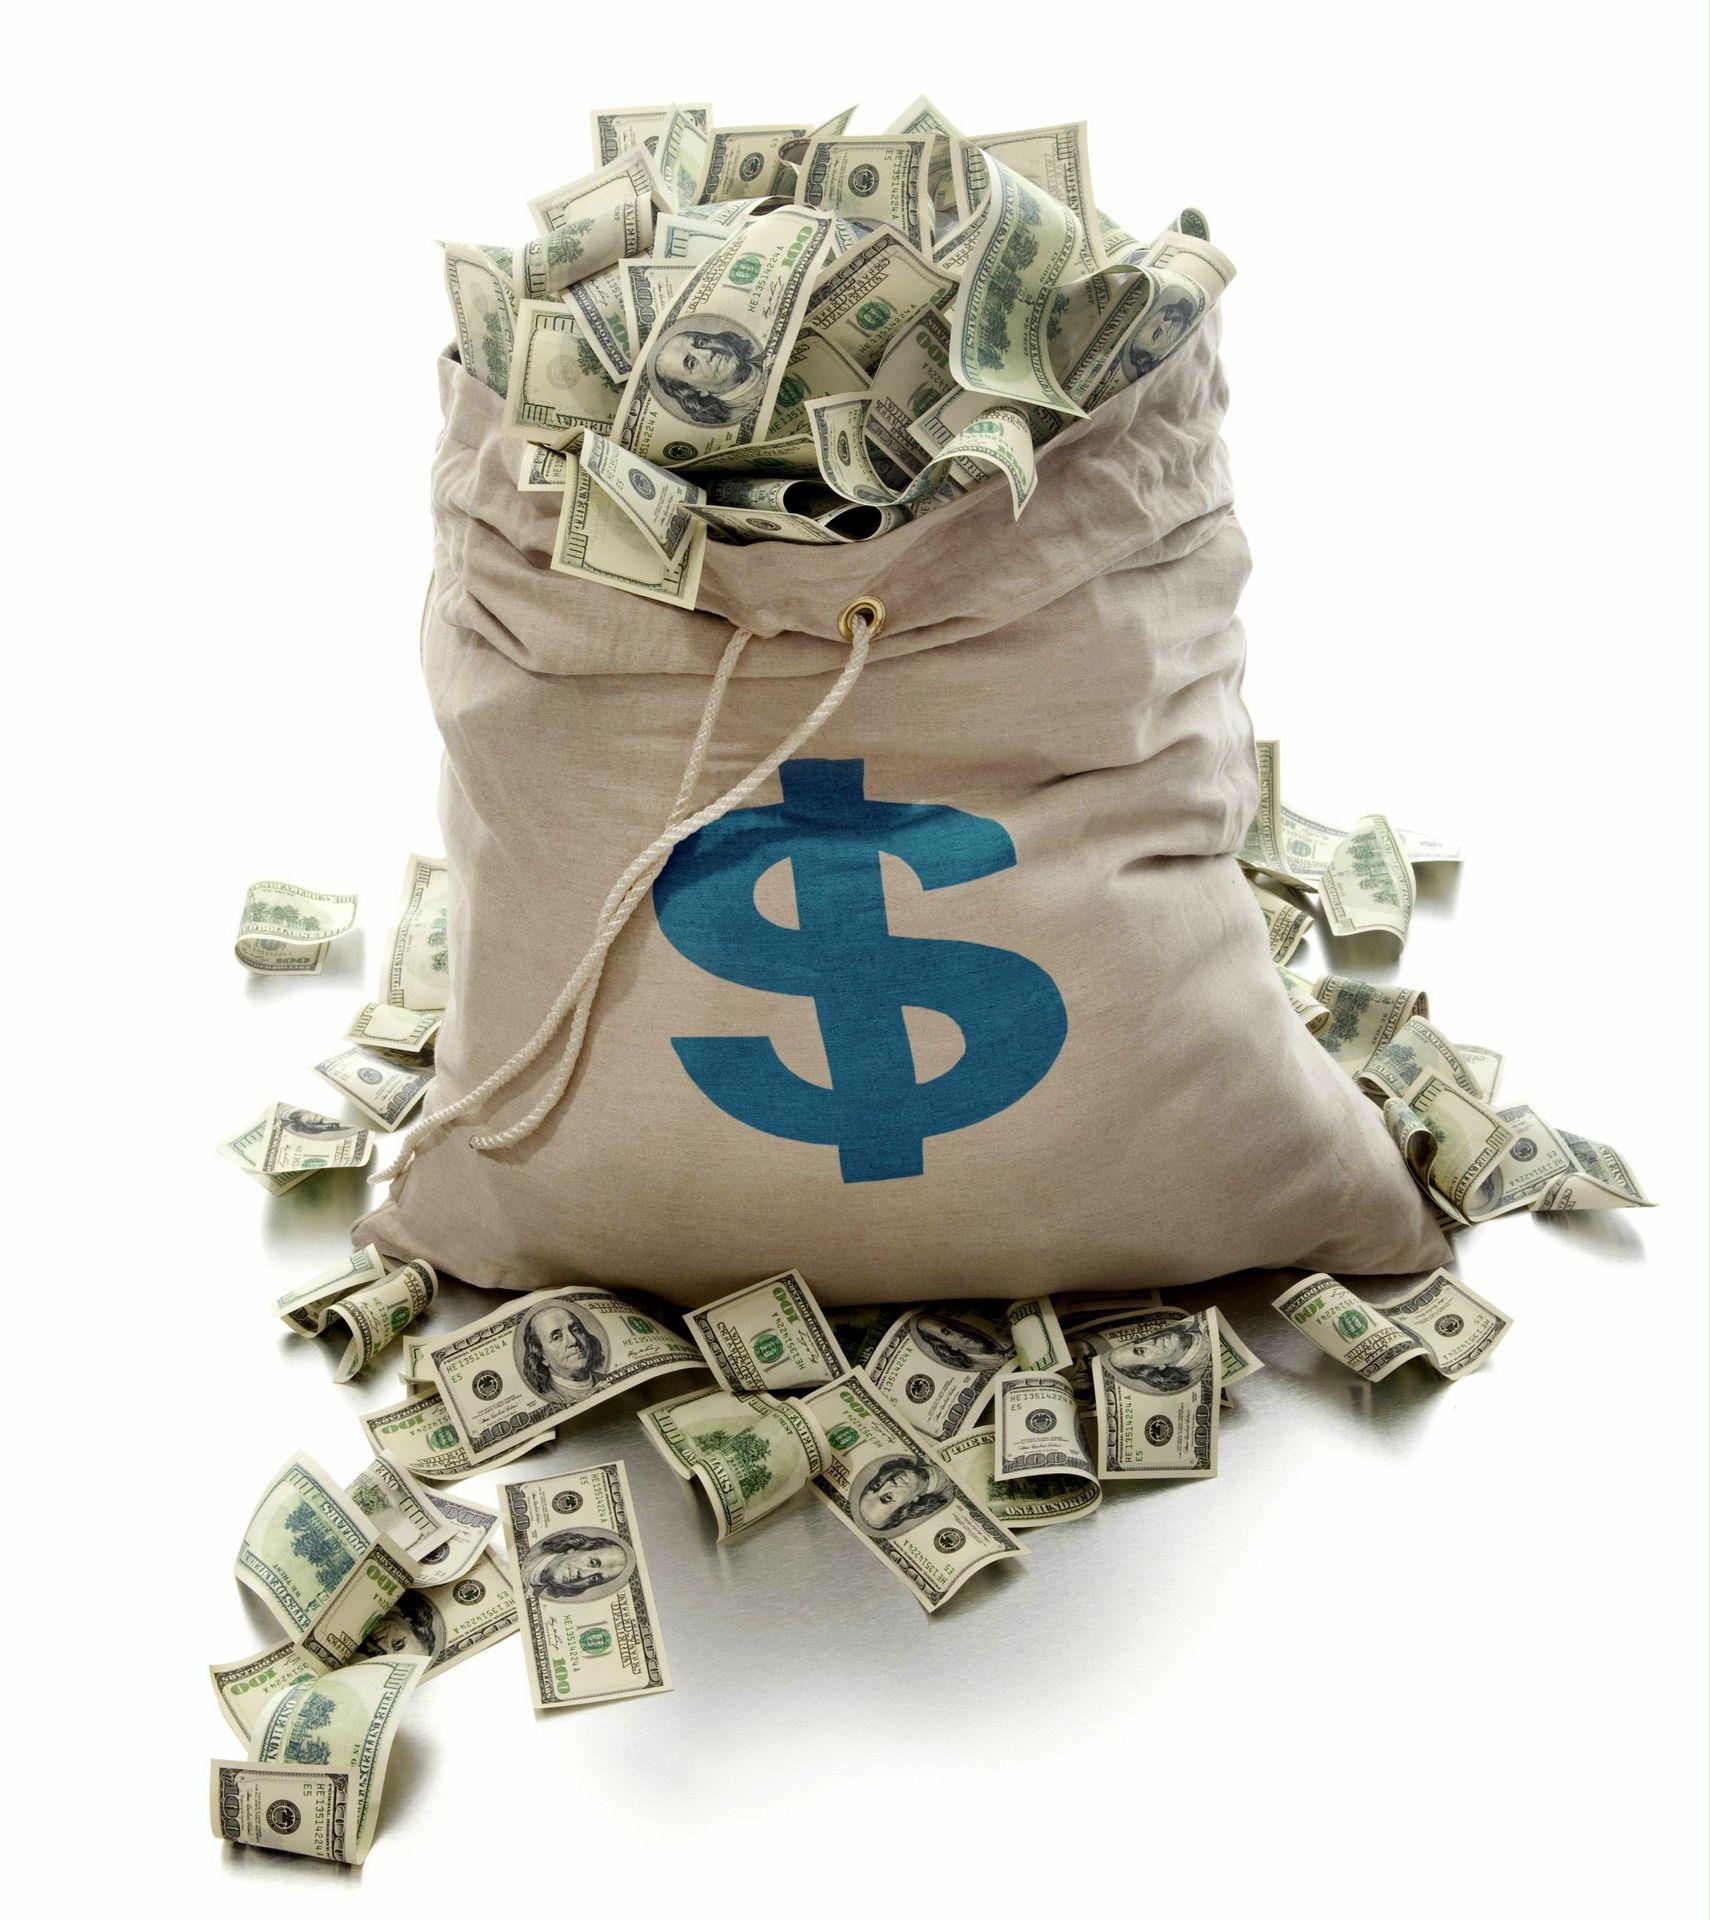 cash-getty-john-kuczala-171682699-56a1c2443df78cf7726db03c-money